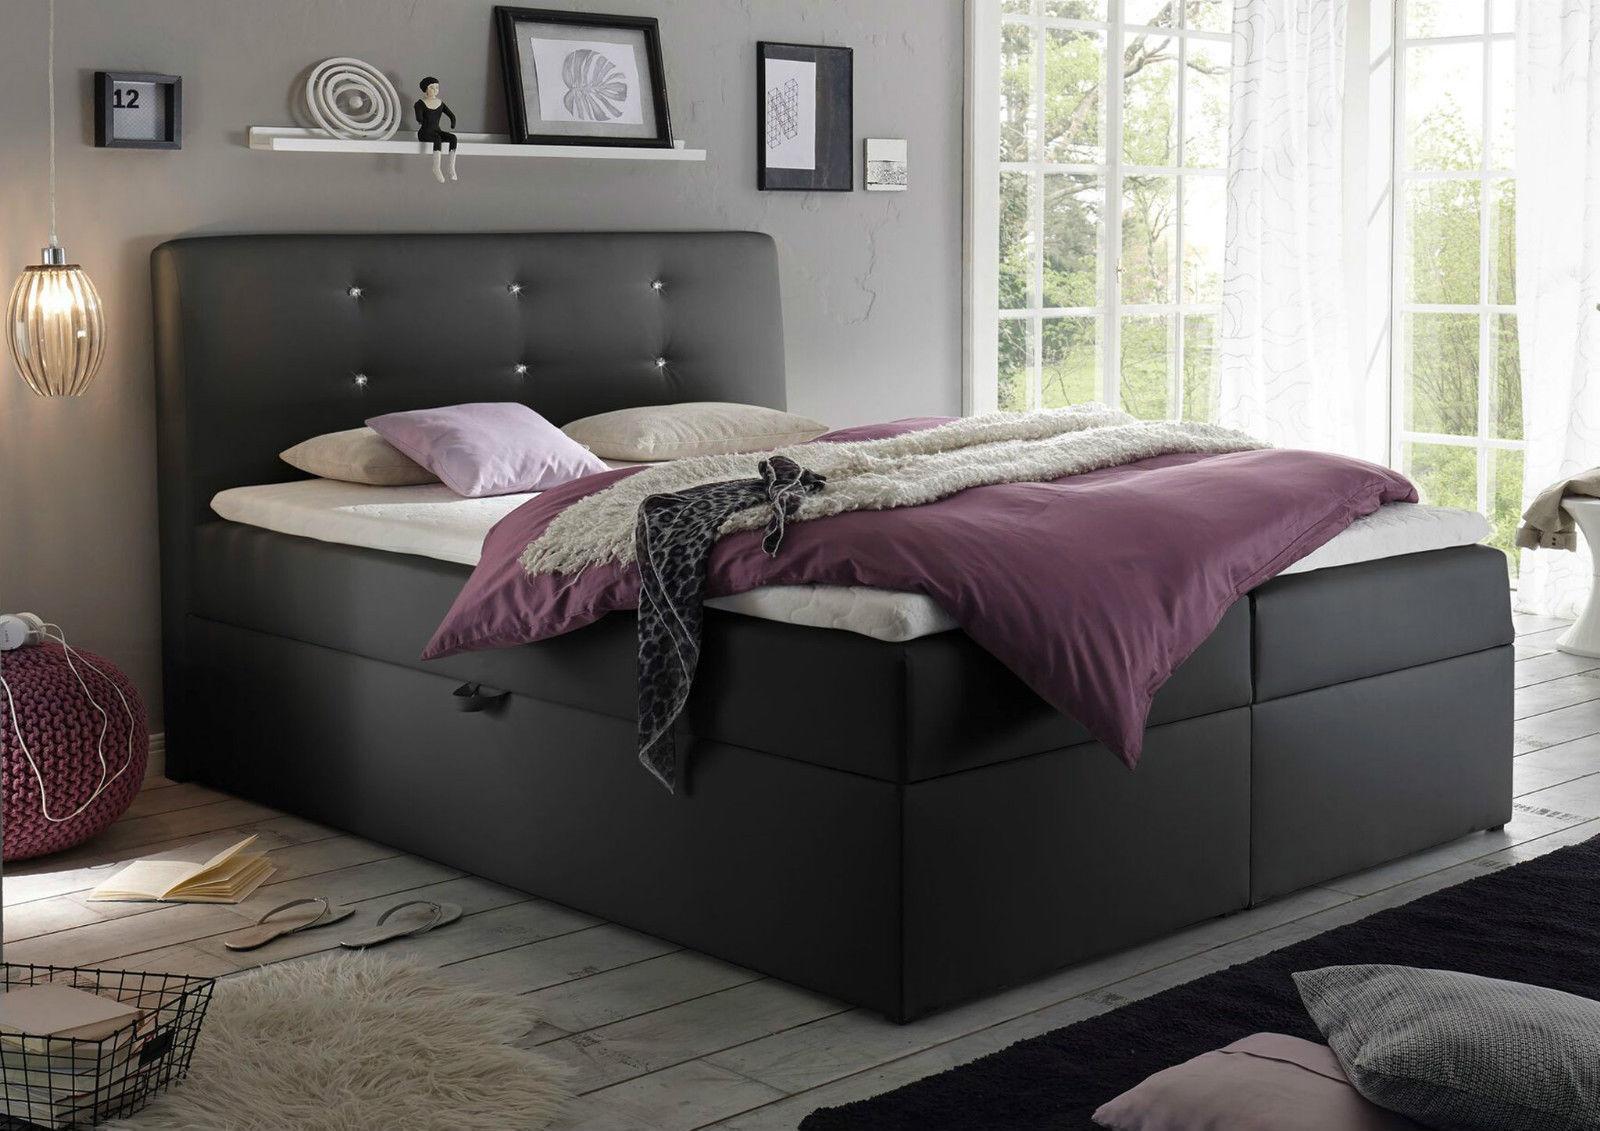 180x200 cm boxspringbett bett komfortbett hotelbett schlafzimmerbett schwarz ebay. Black Bedroom Furniture Sets. Home Design Ideas